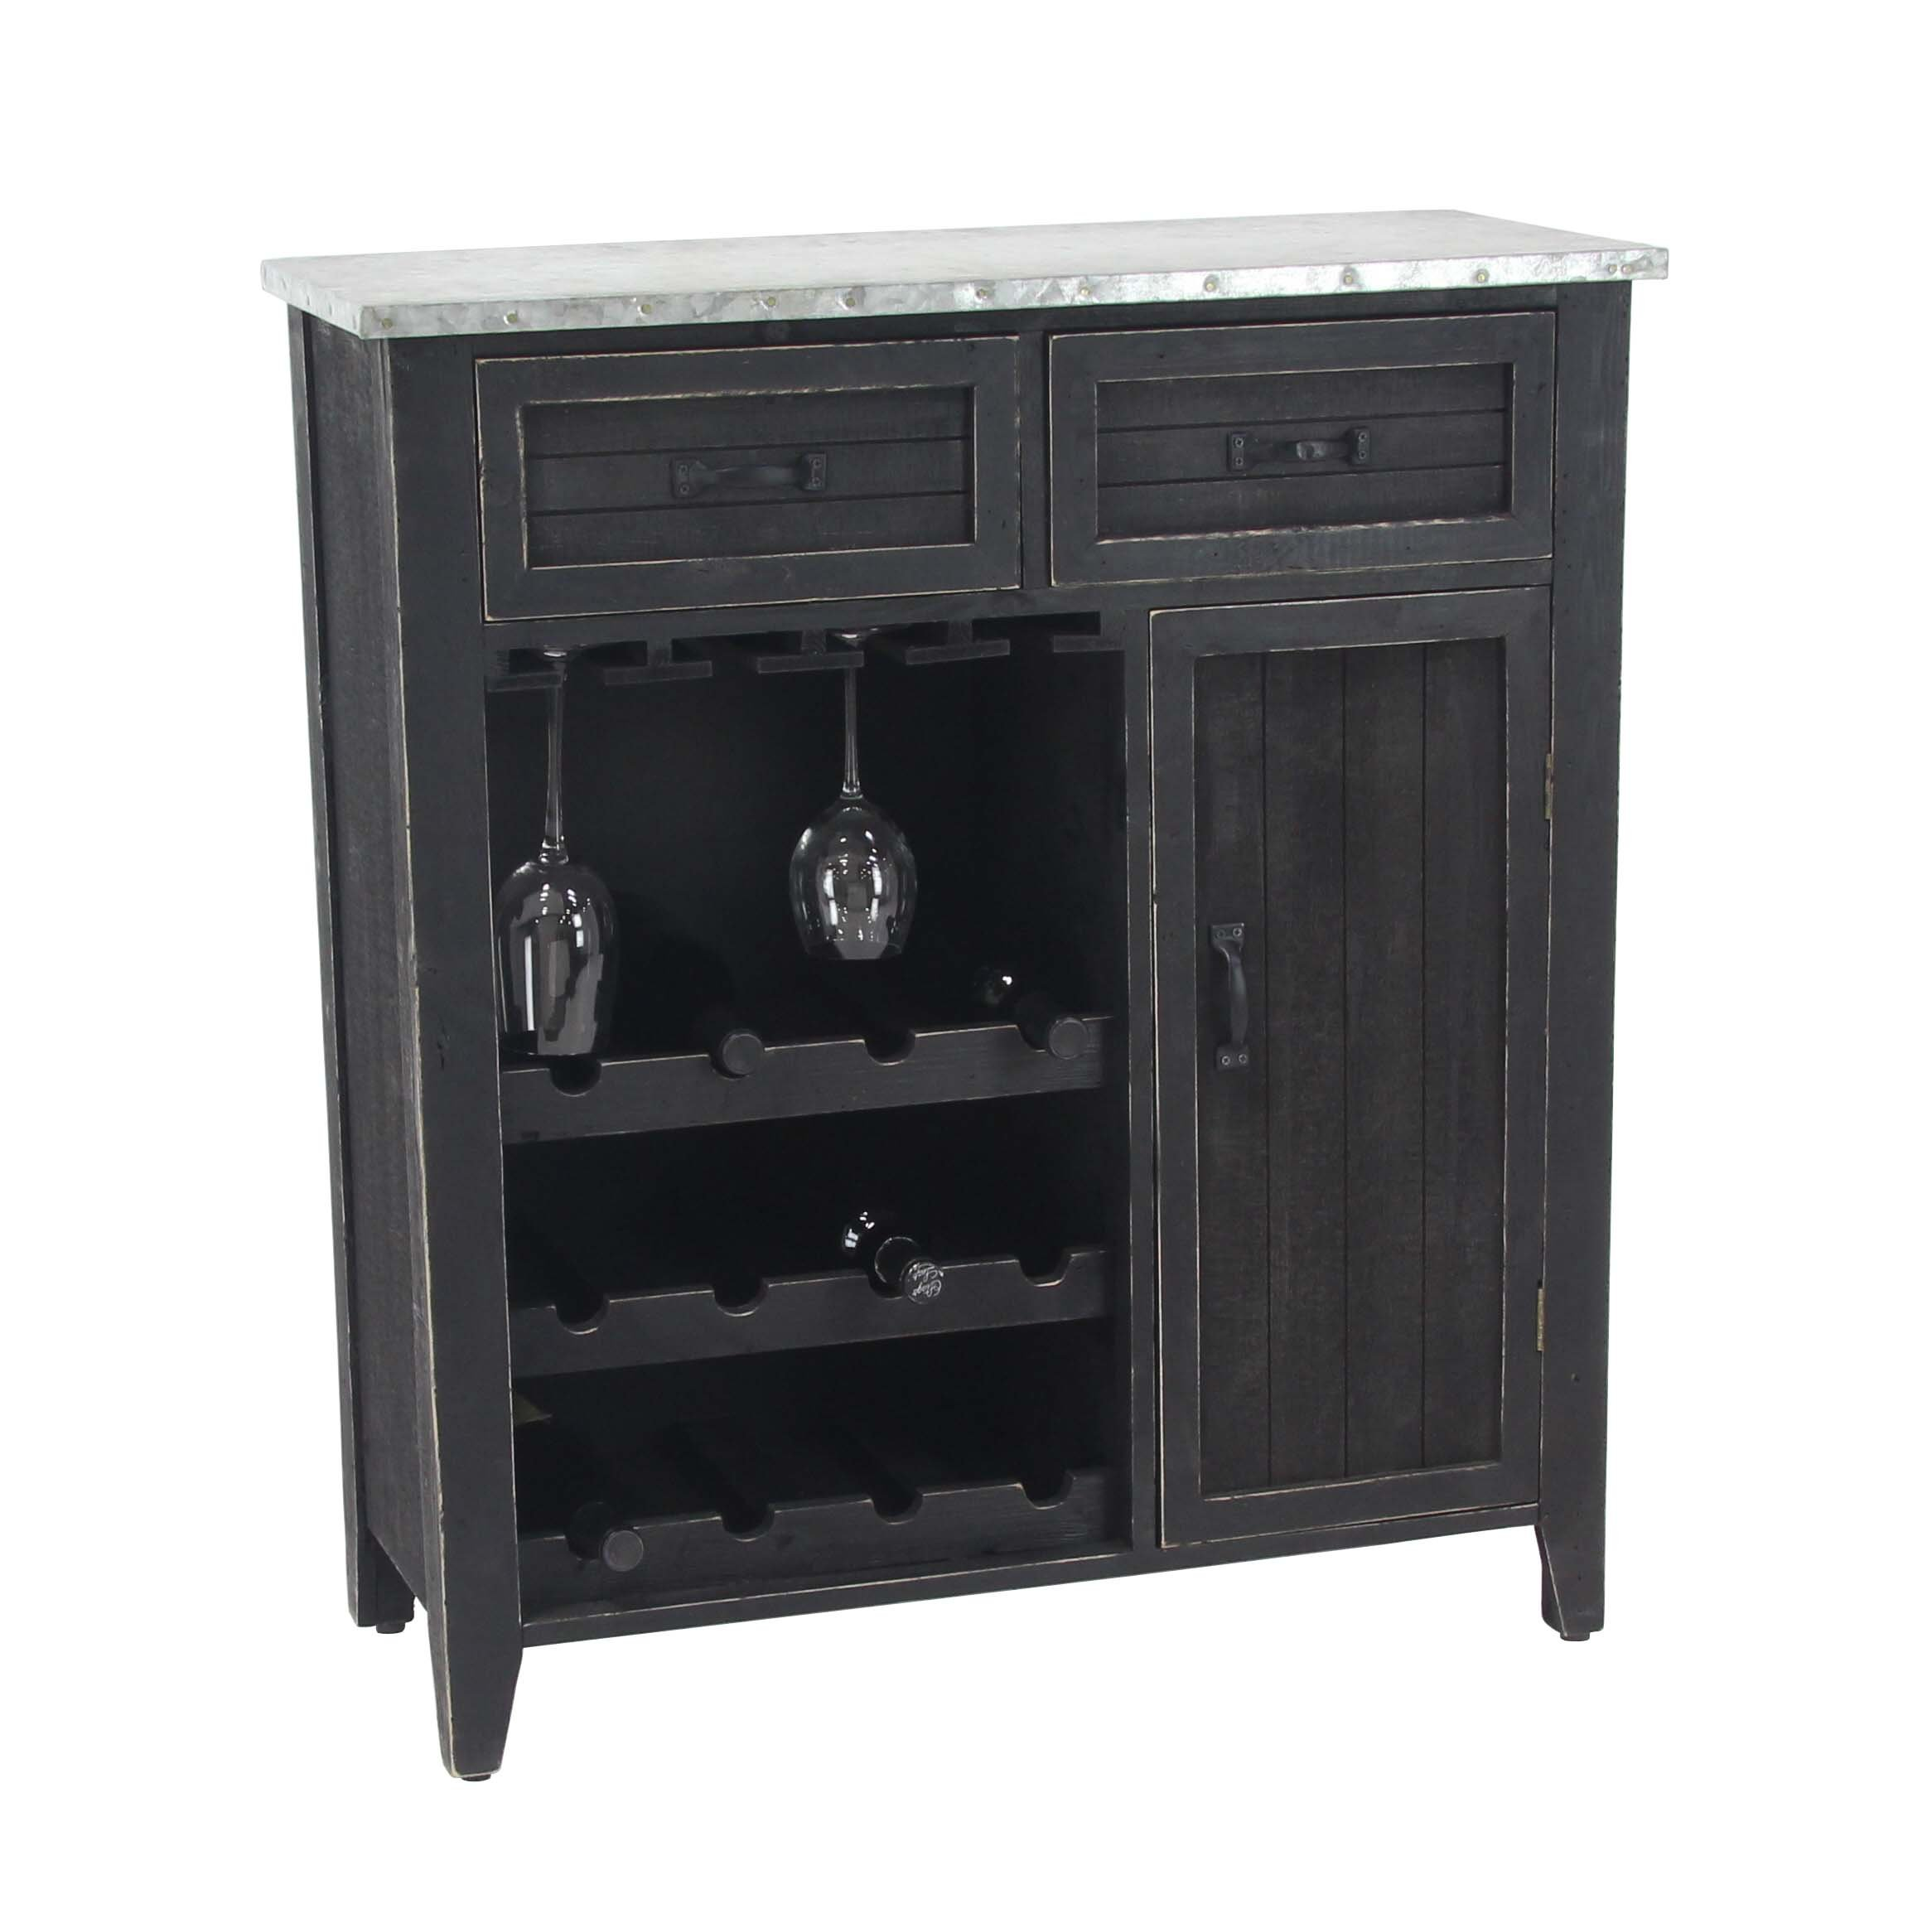 Deco 79 45894 Wine Cabinet, Black by Deco 79